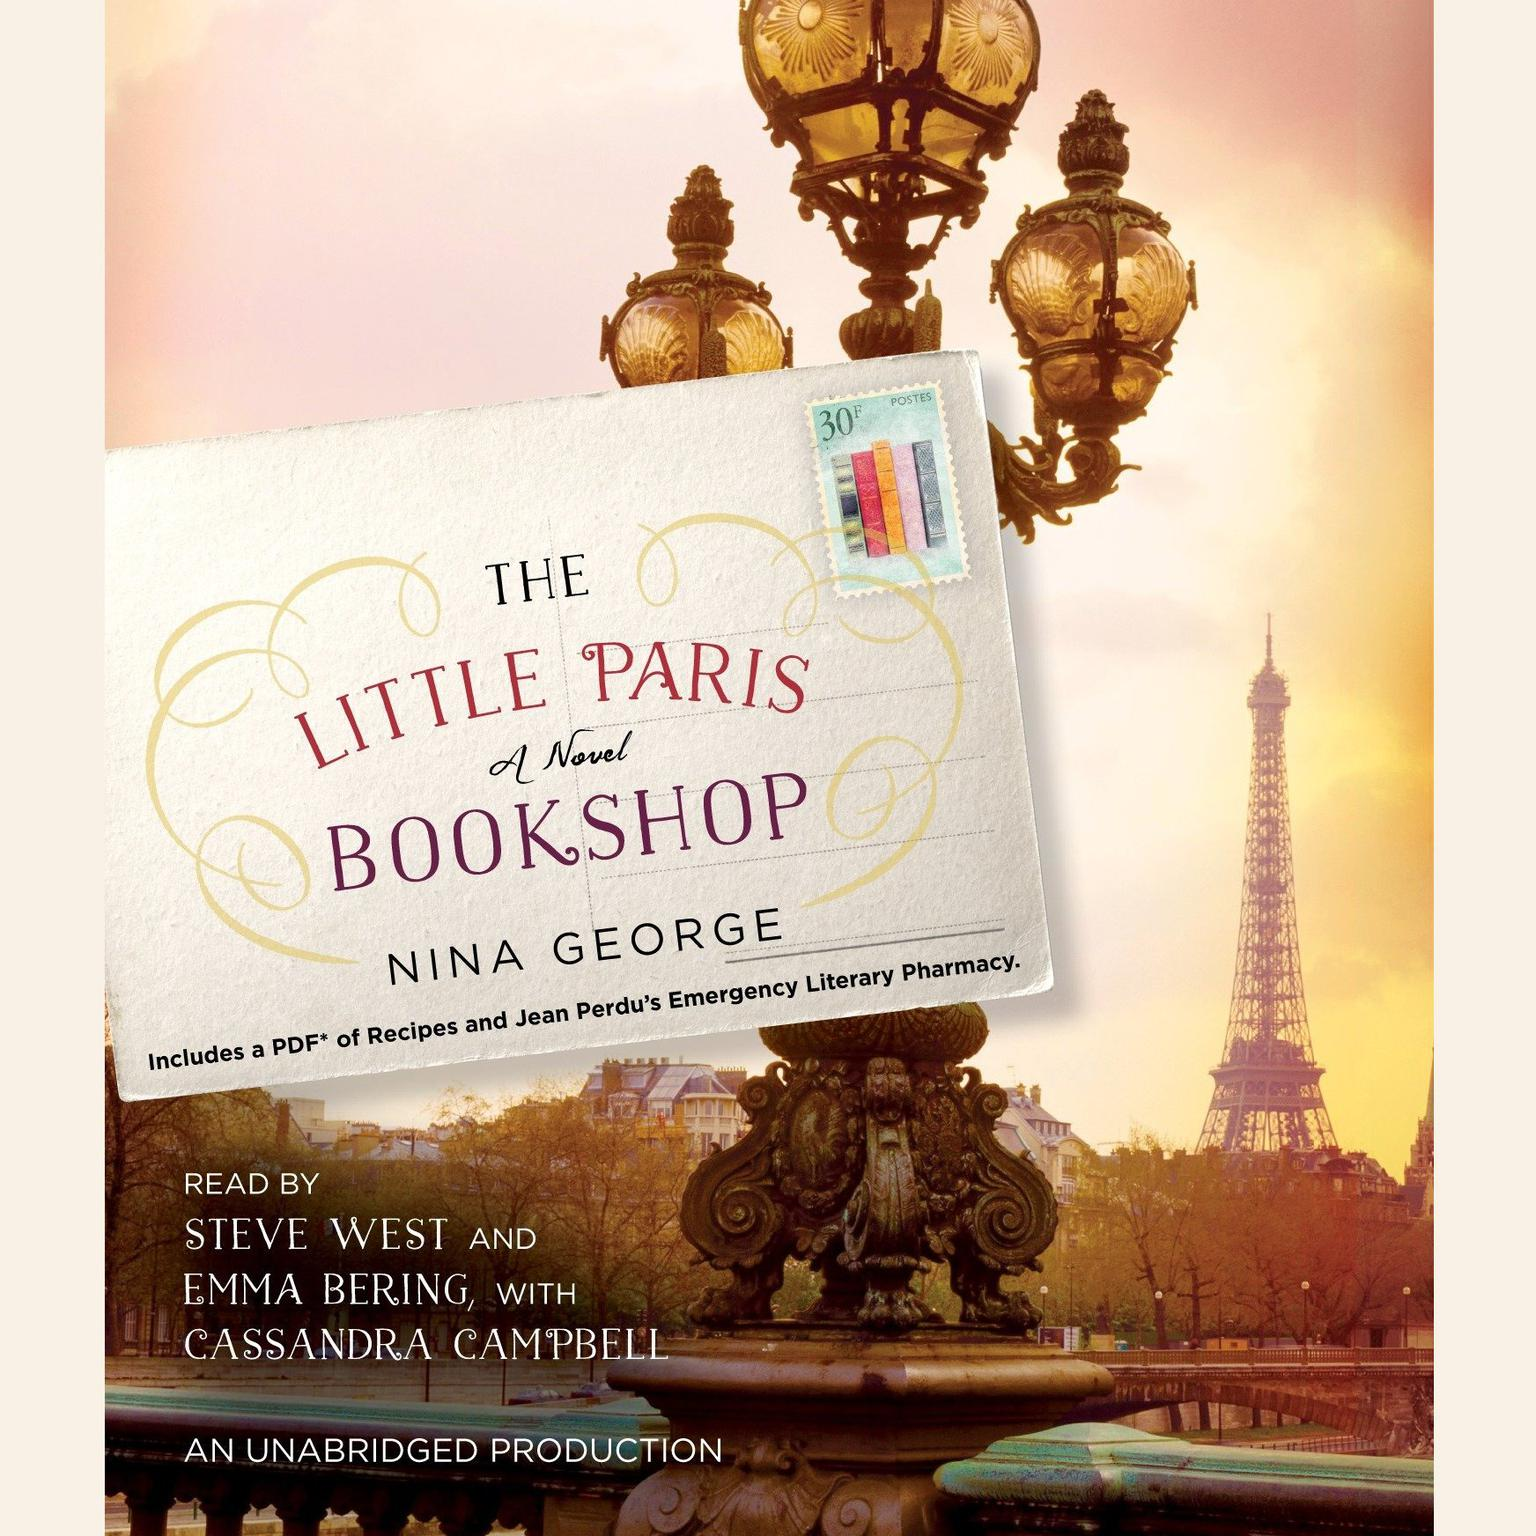 Download The Little Paris Bookshop Audiobook By Nina